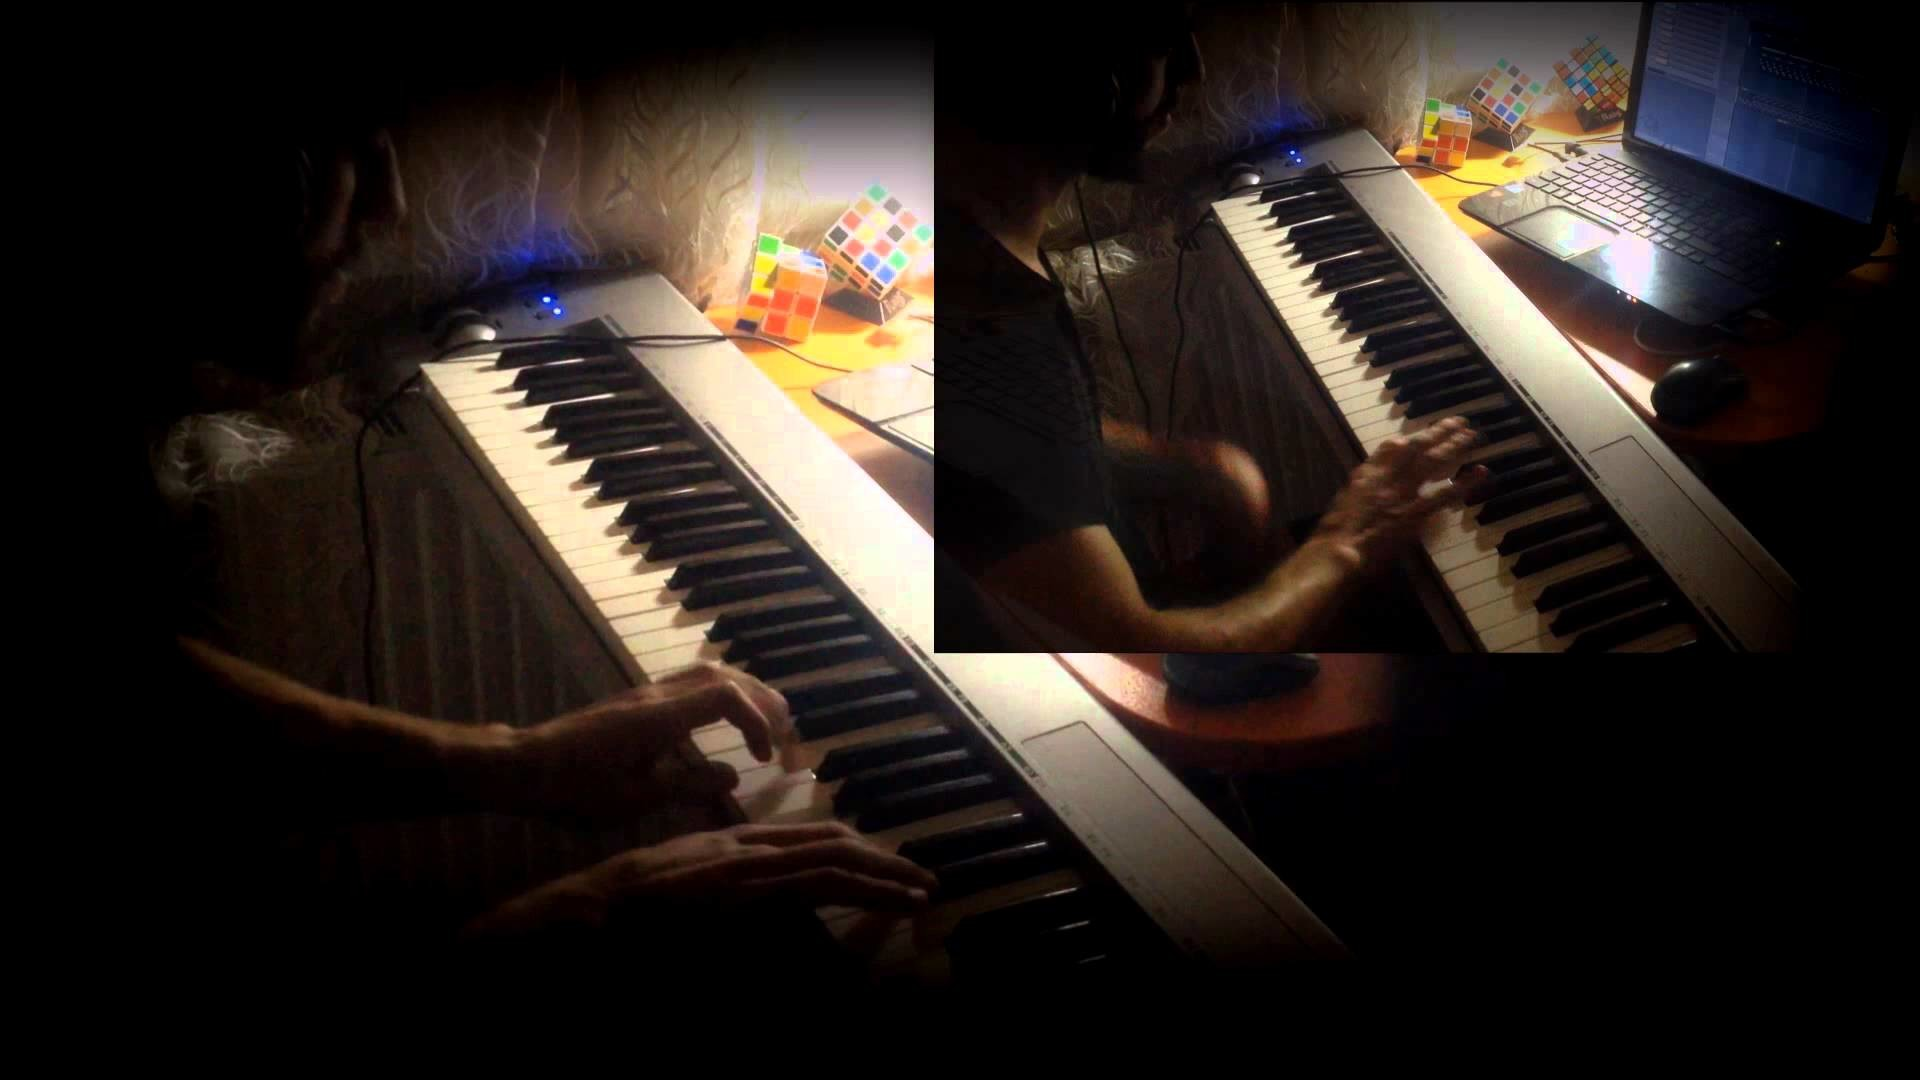 Silent Hill – Theme of Laura (Reprise) Piano /Violin /Bells /Drum